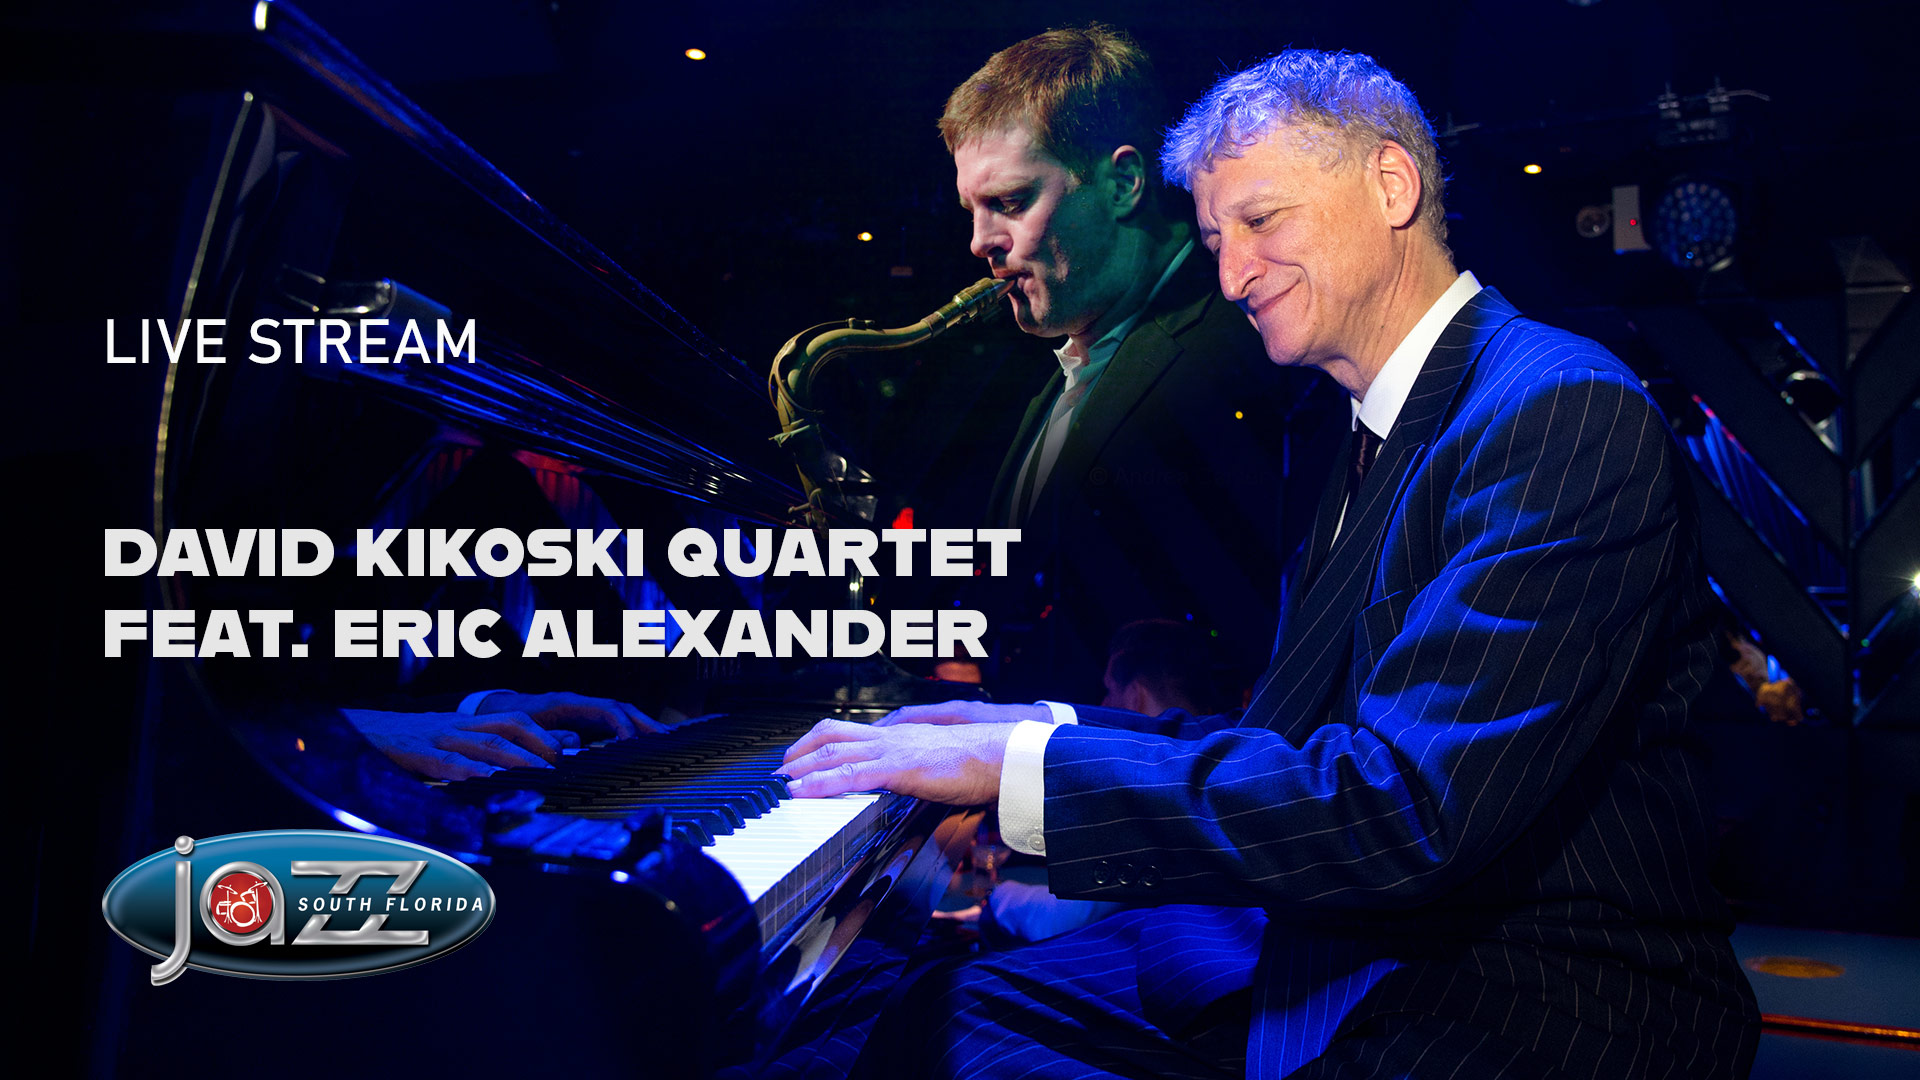 Photo for David Kikoski Quartet feat. Eric Alexander on ViewStub